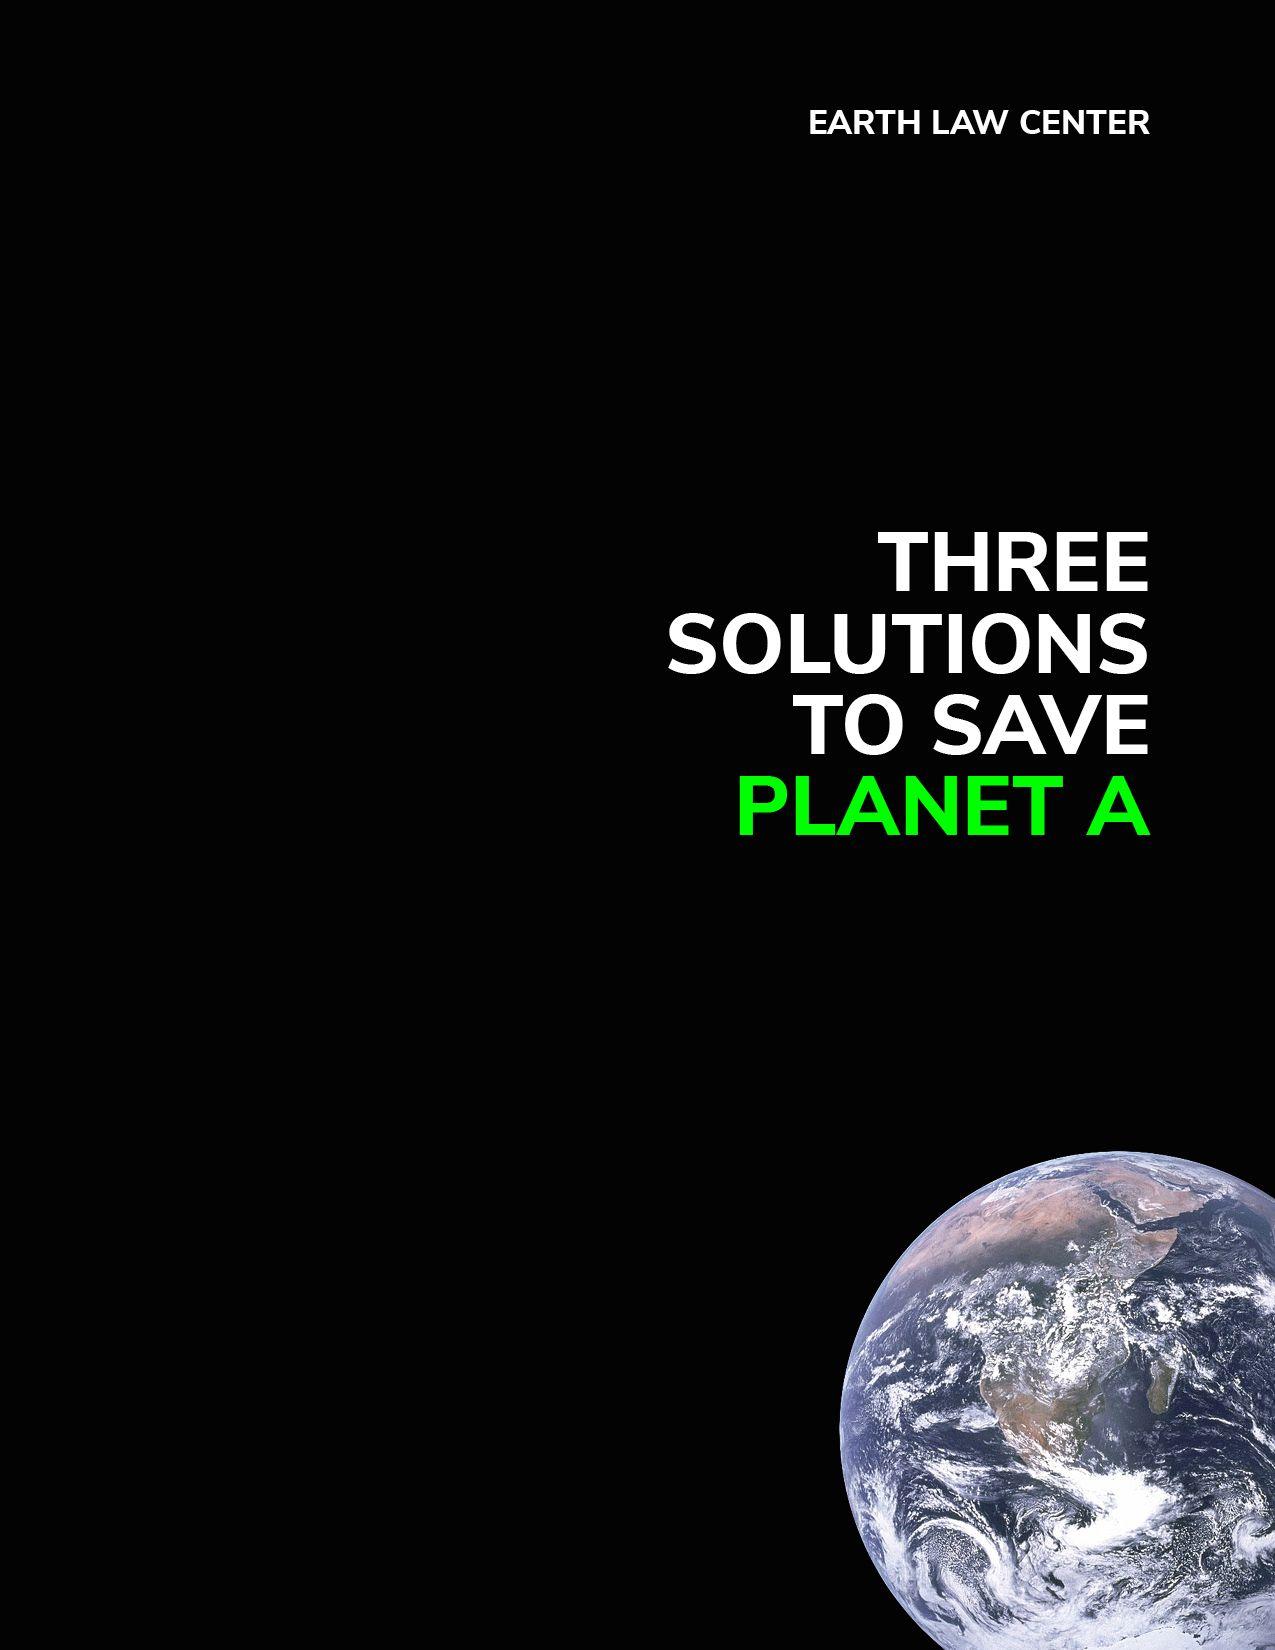 three-solutions-save-planet-a-lg.jpg